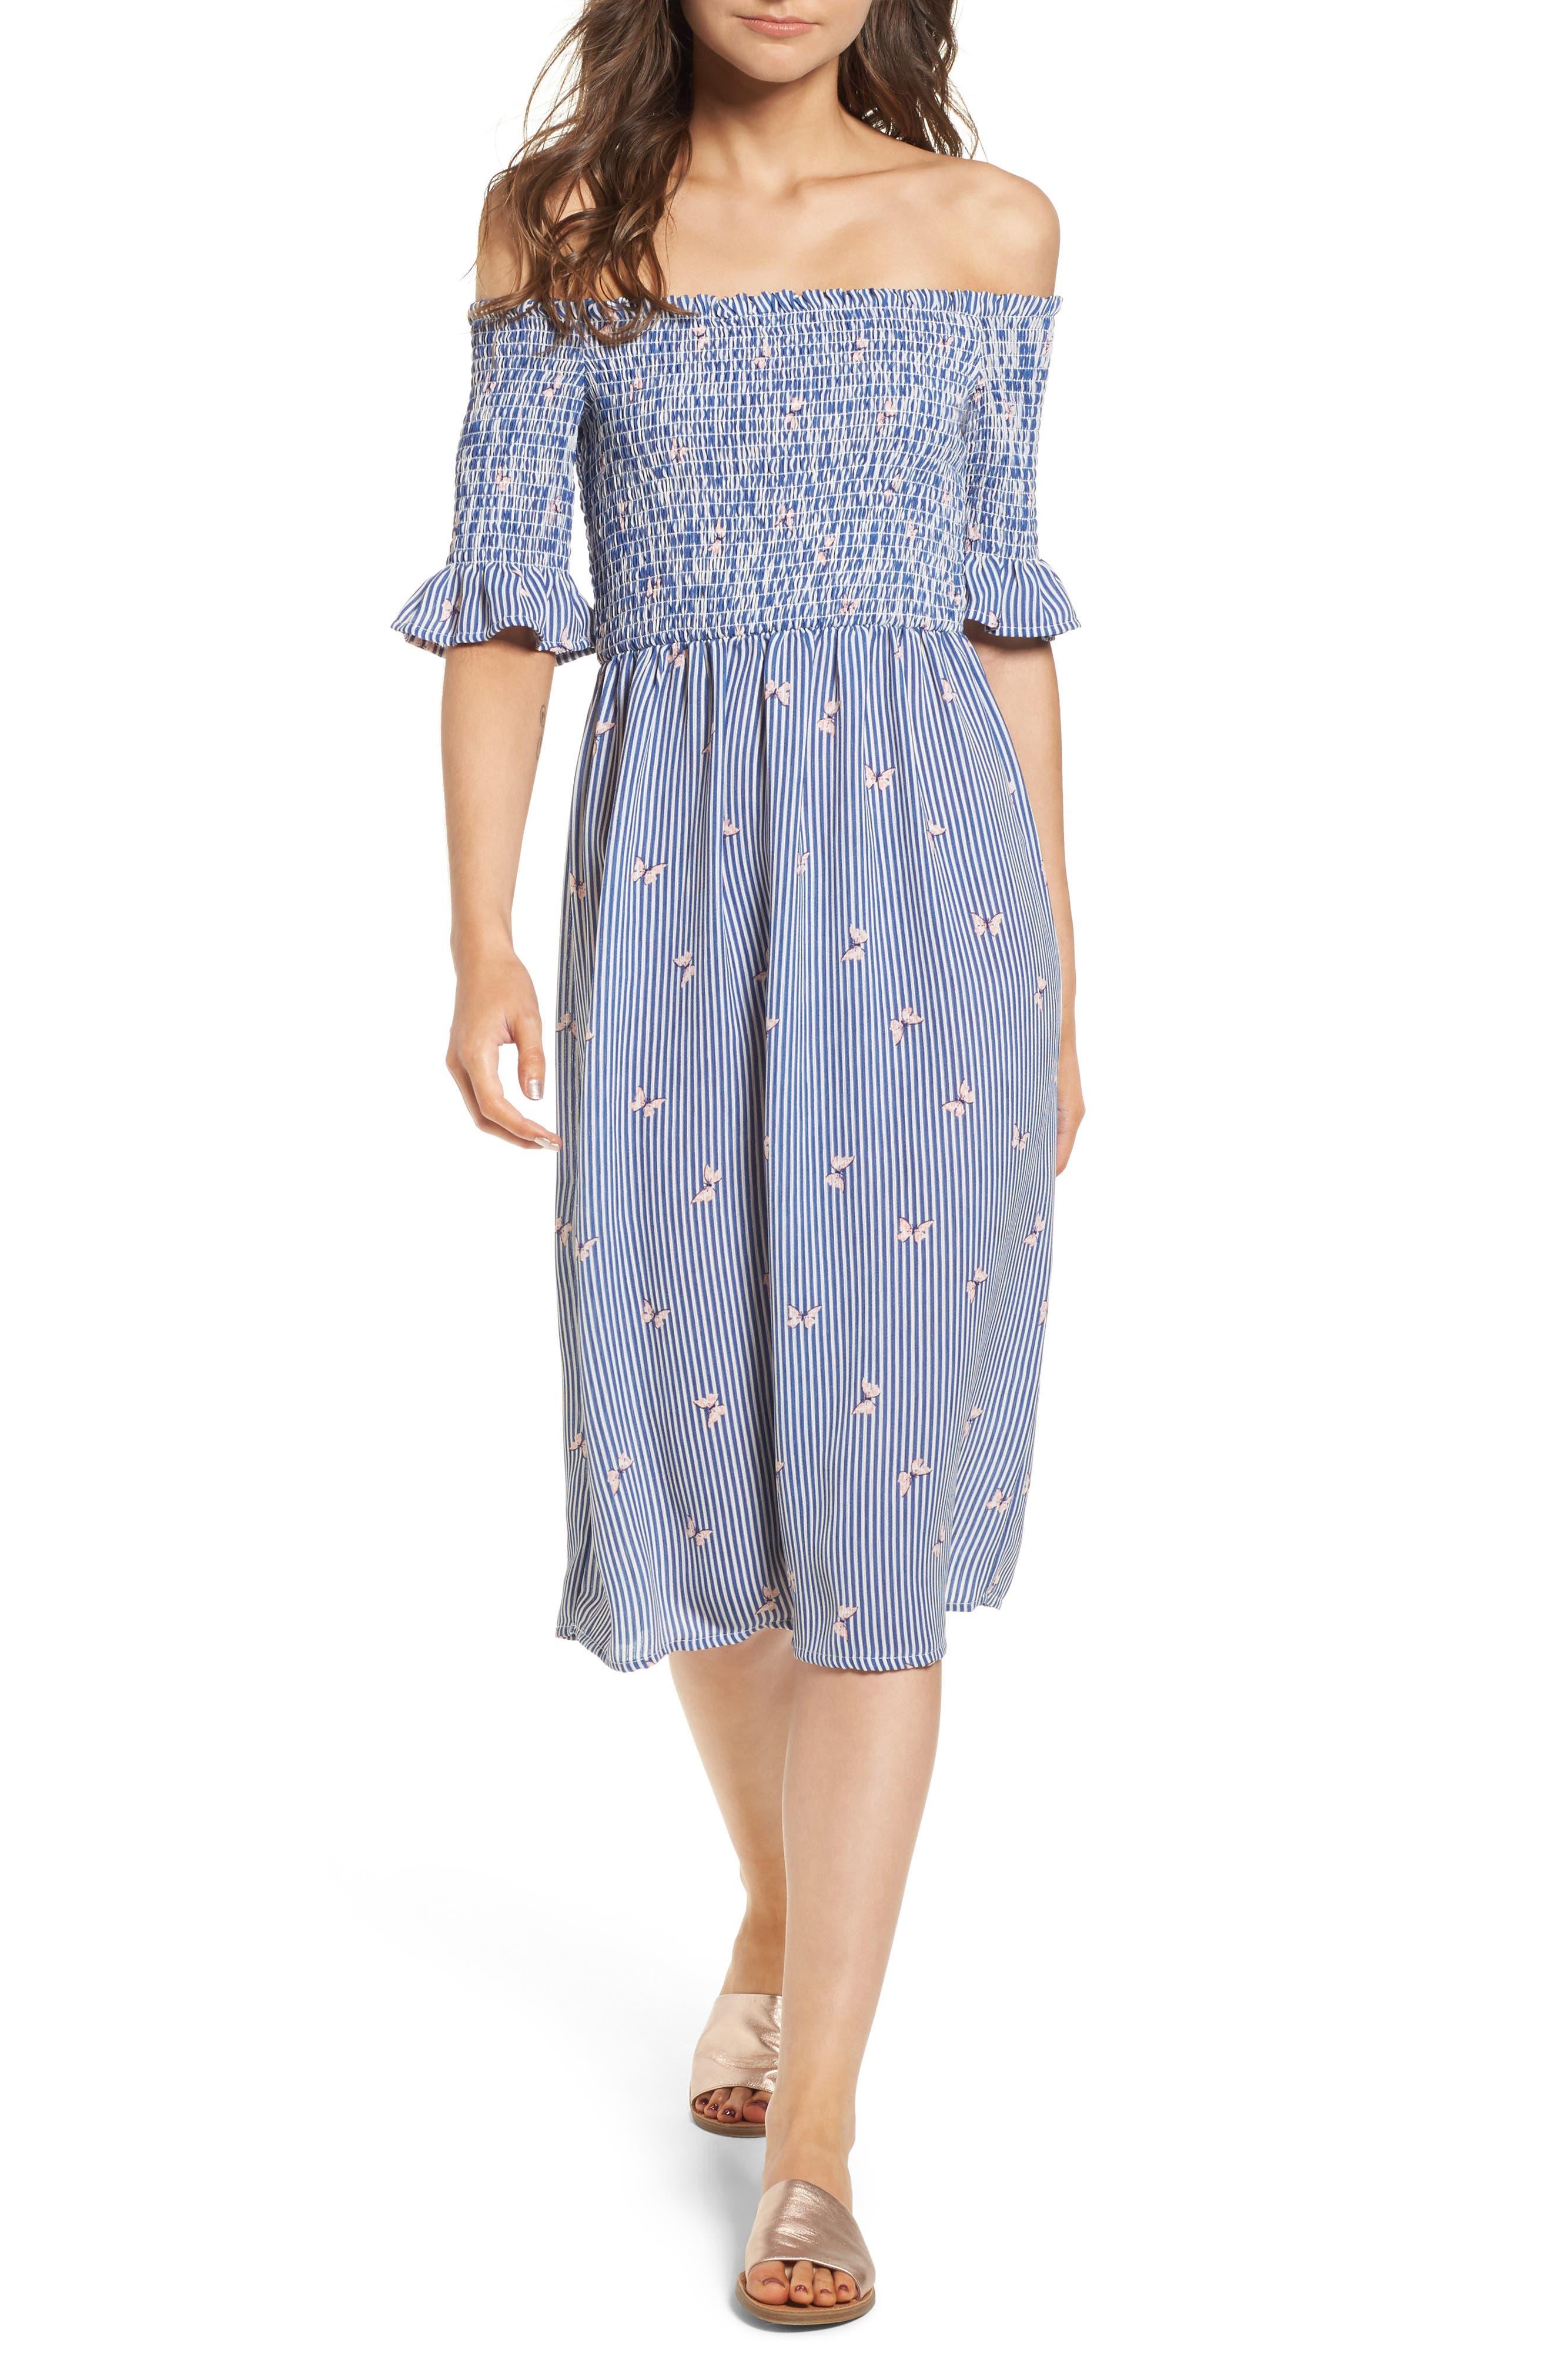 Smocked Midi Dress,                             Main thumbnail 1, color,                             Off White/ Blue